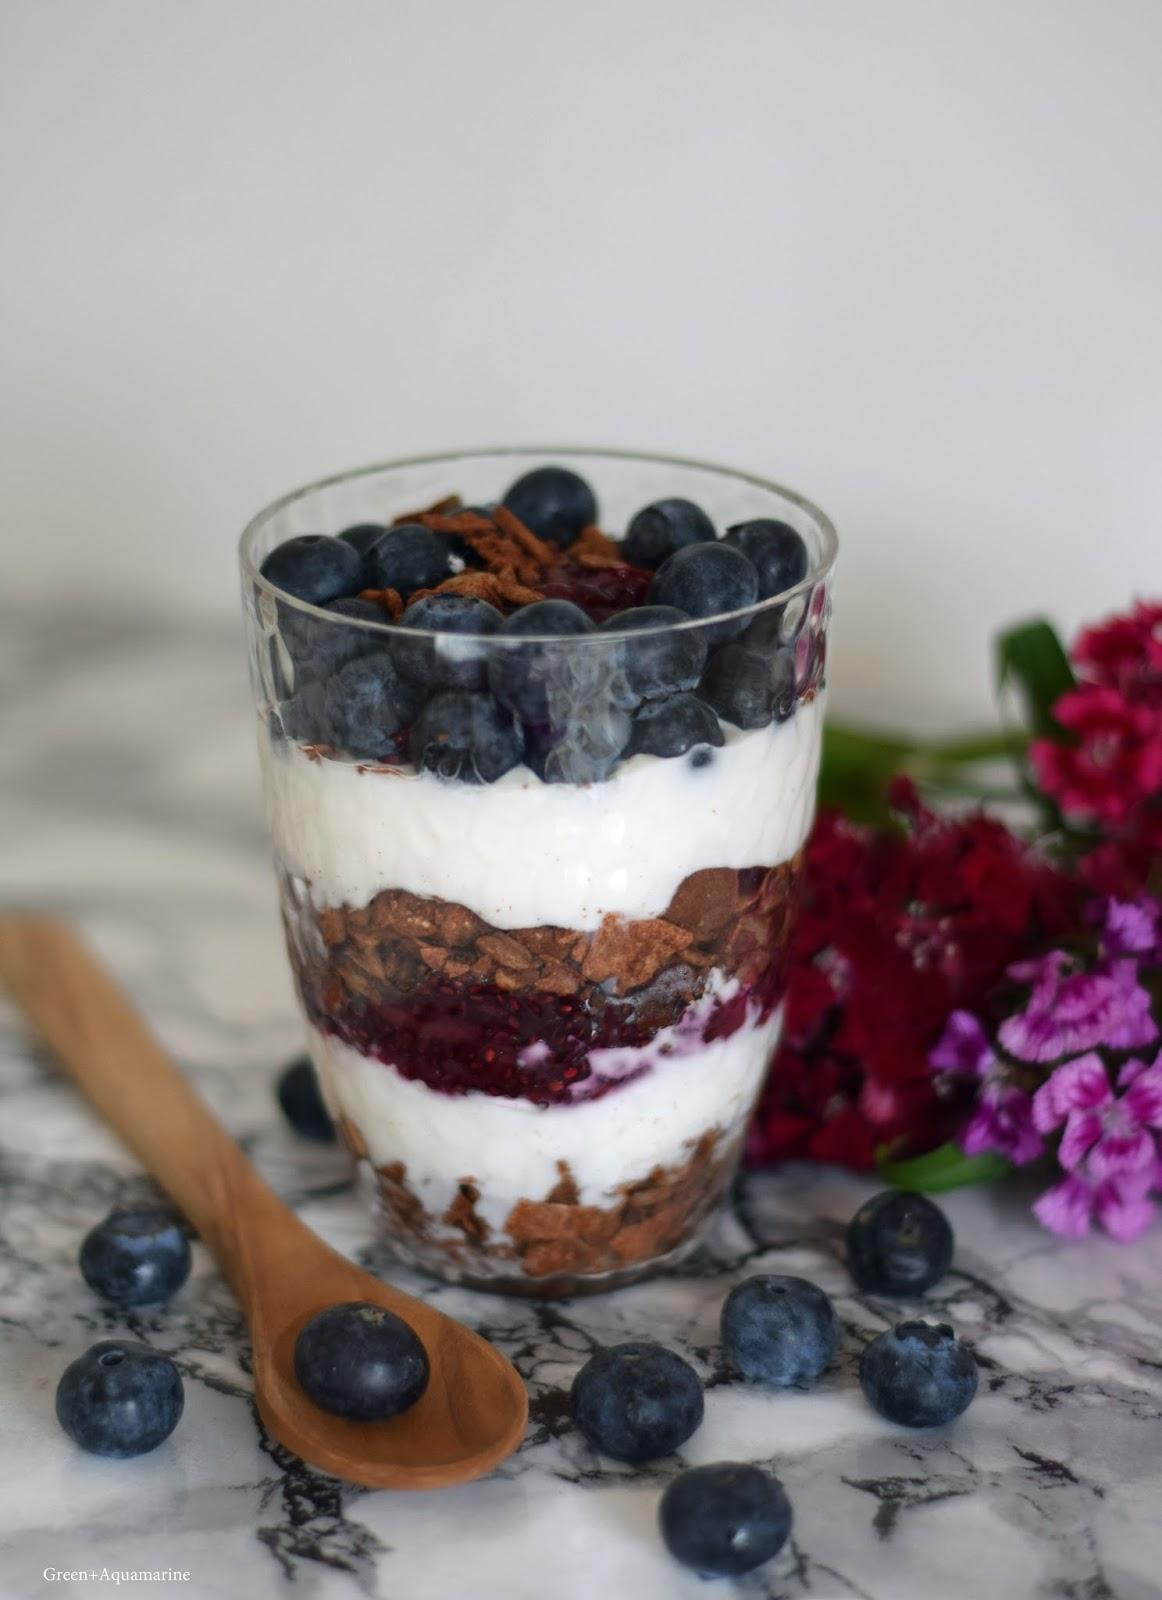 Black Forest inspired parfait, using Planet Organic's paleo granola. Via @eleanormayc